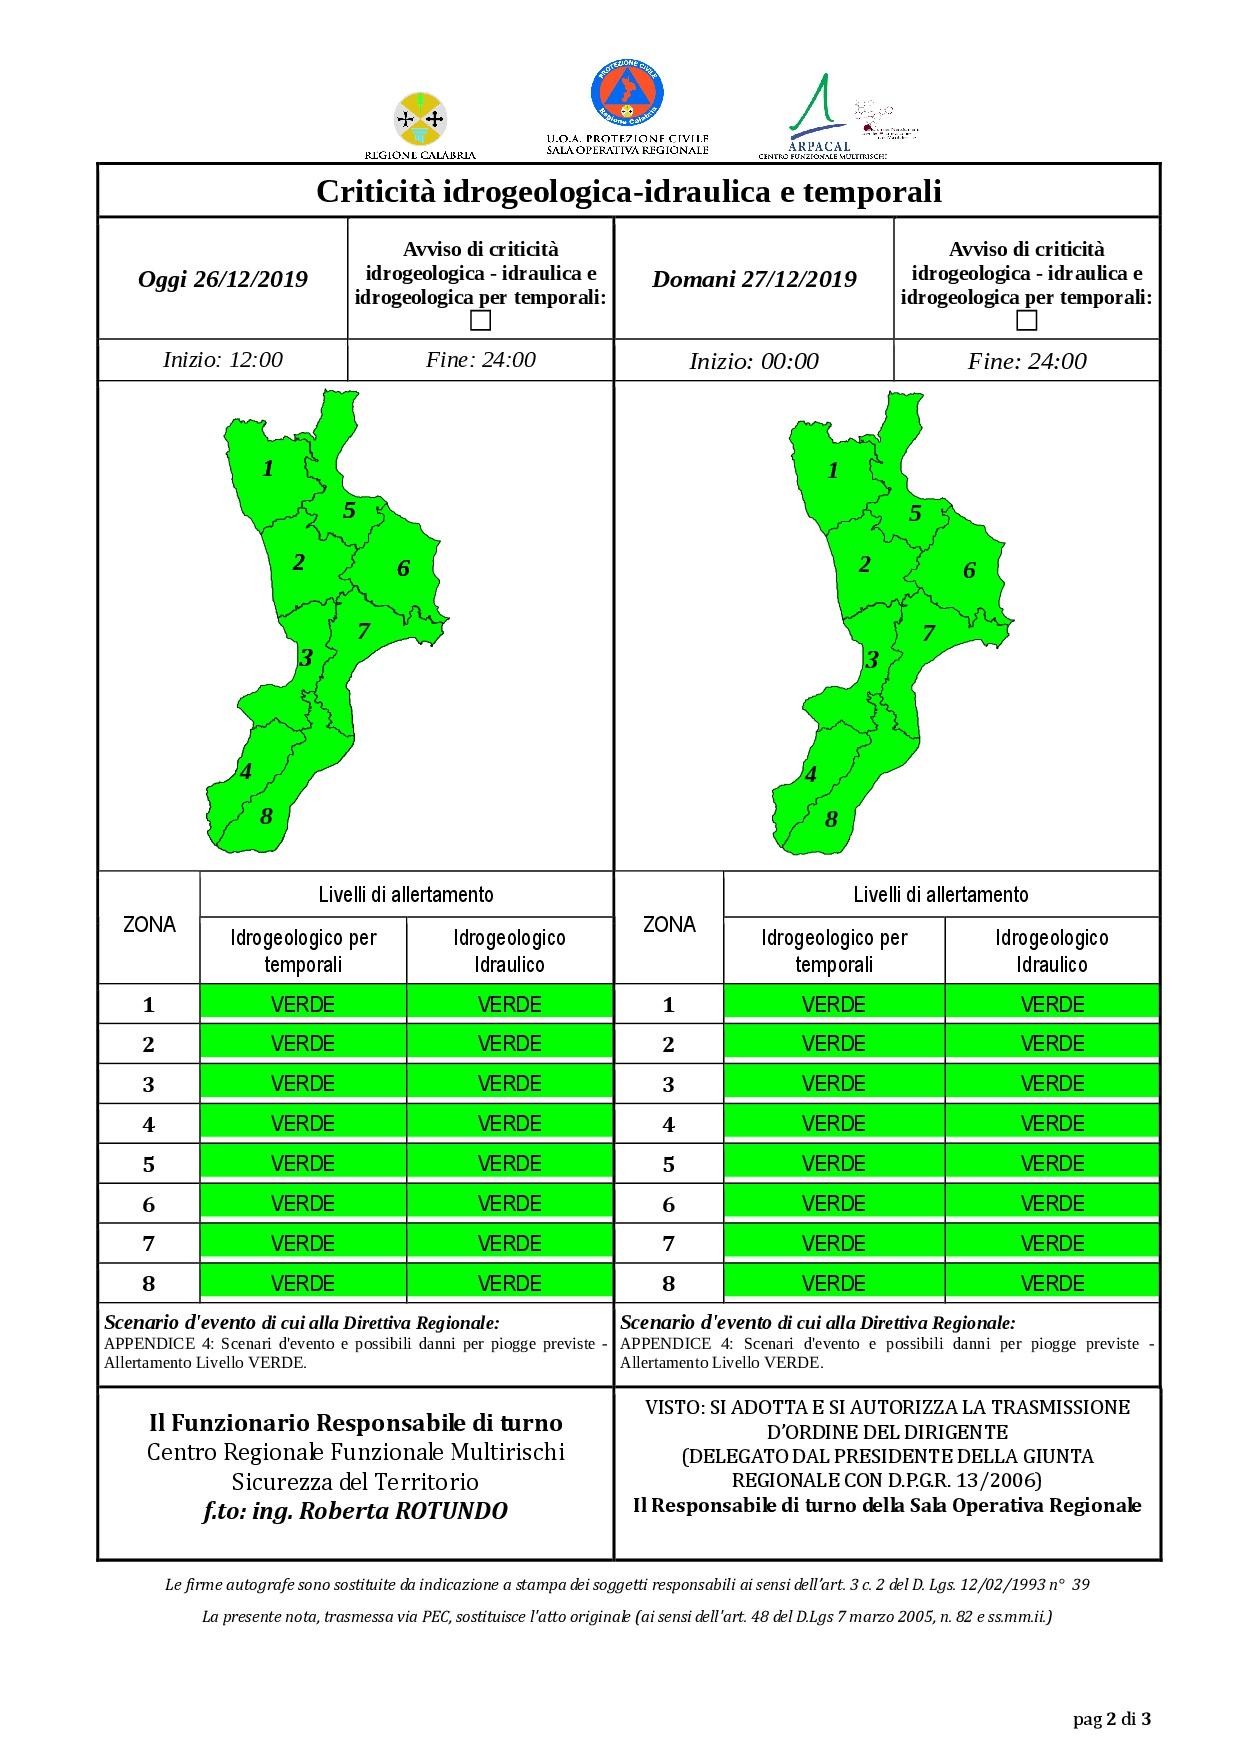 Criticità idrogeologica-idraulica e temporali in Calabria 26-12-2019